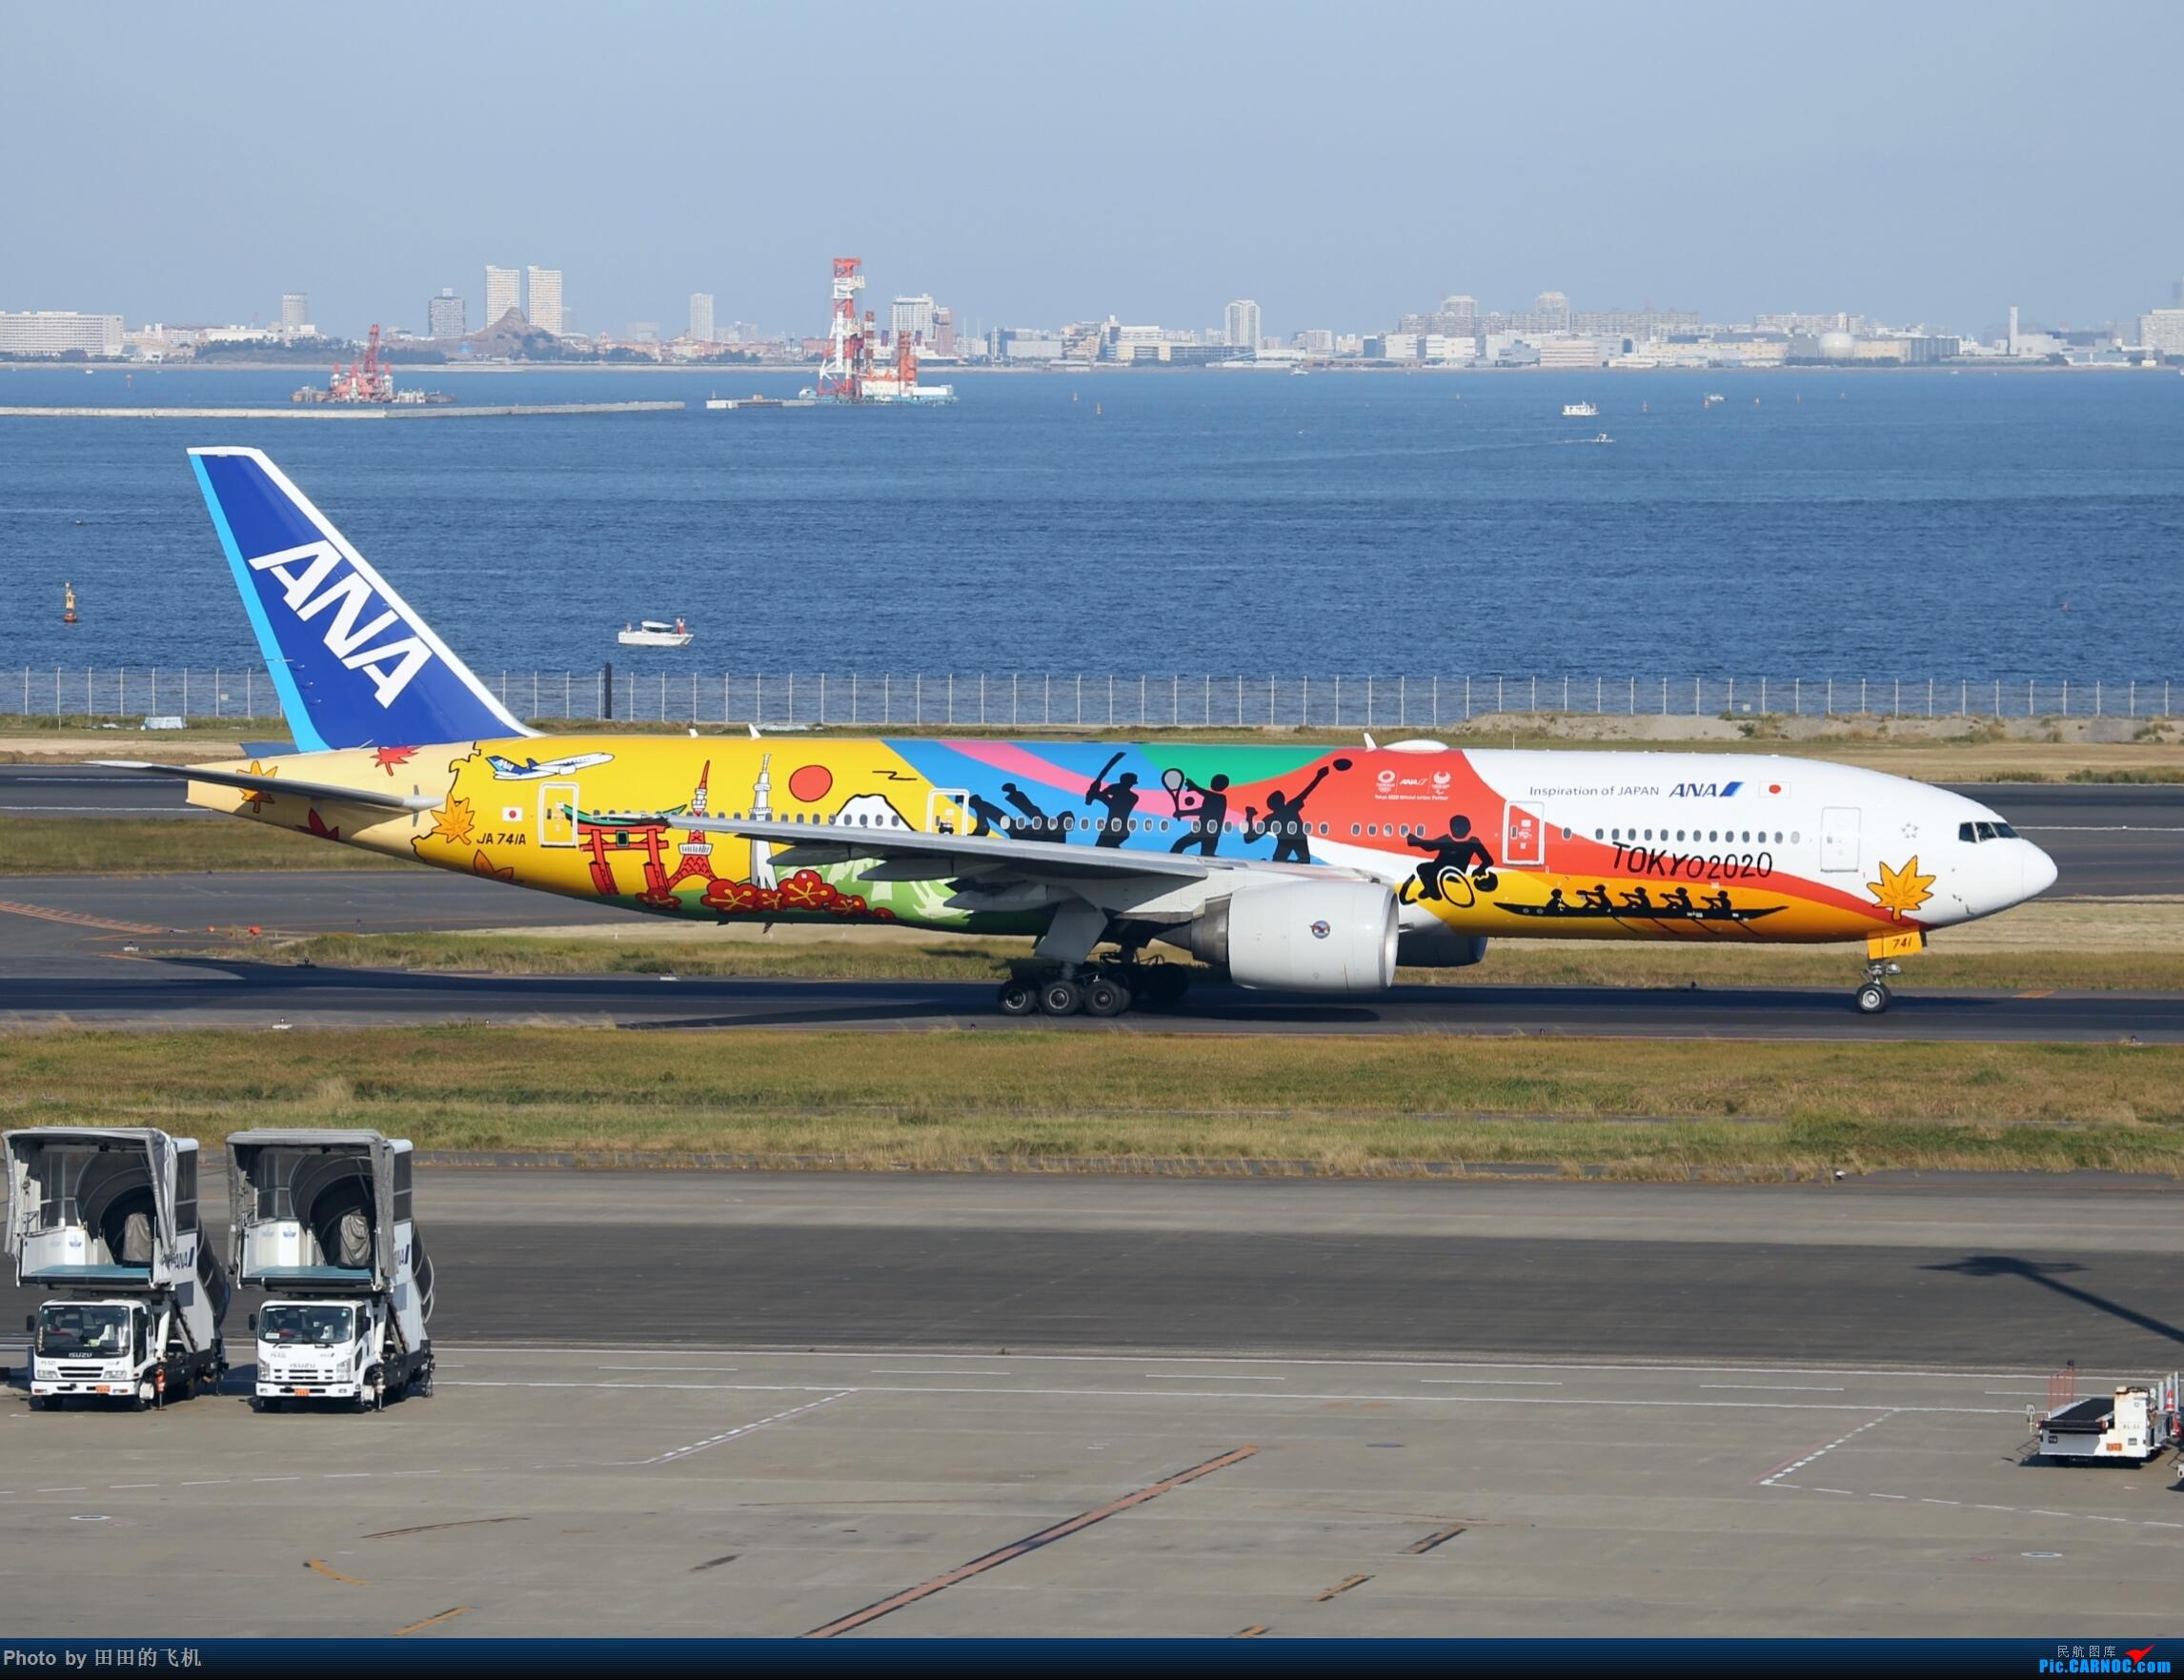 Re:[原创]整理一下去年东京羽田机场拍的飞机 777-200 JA741A 东京羽田机场